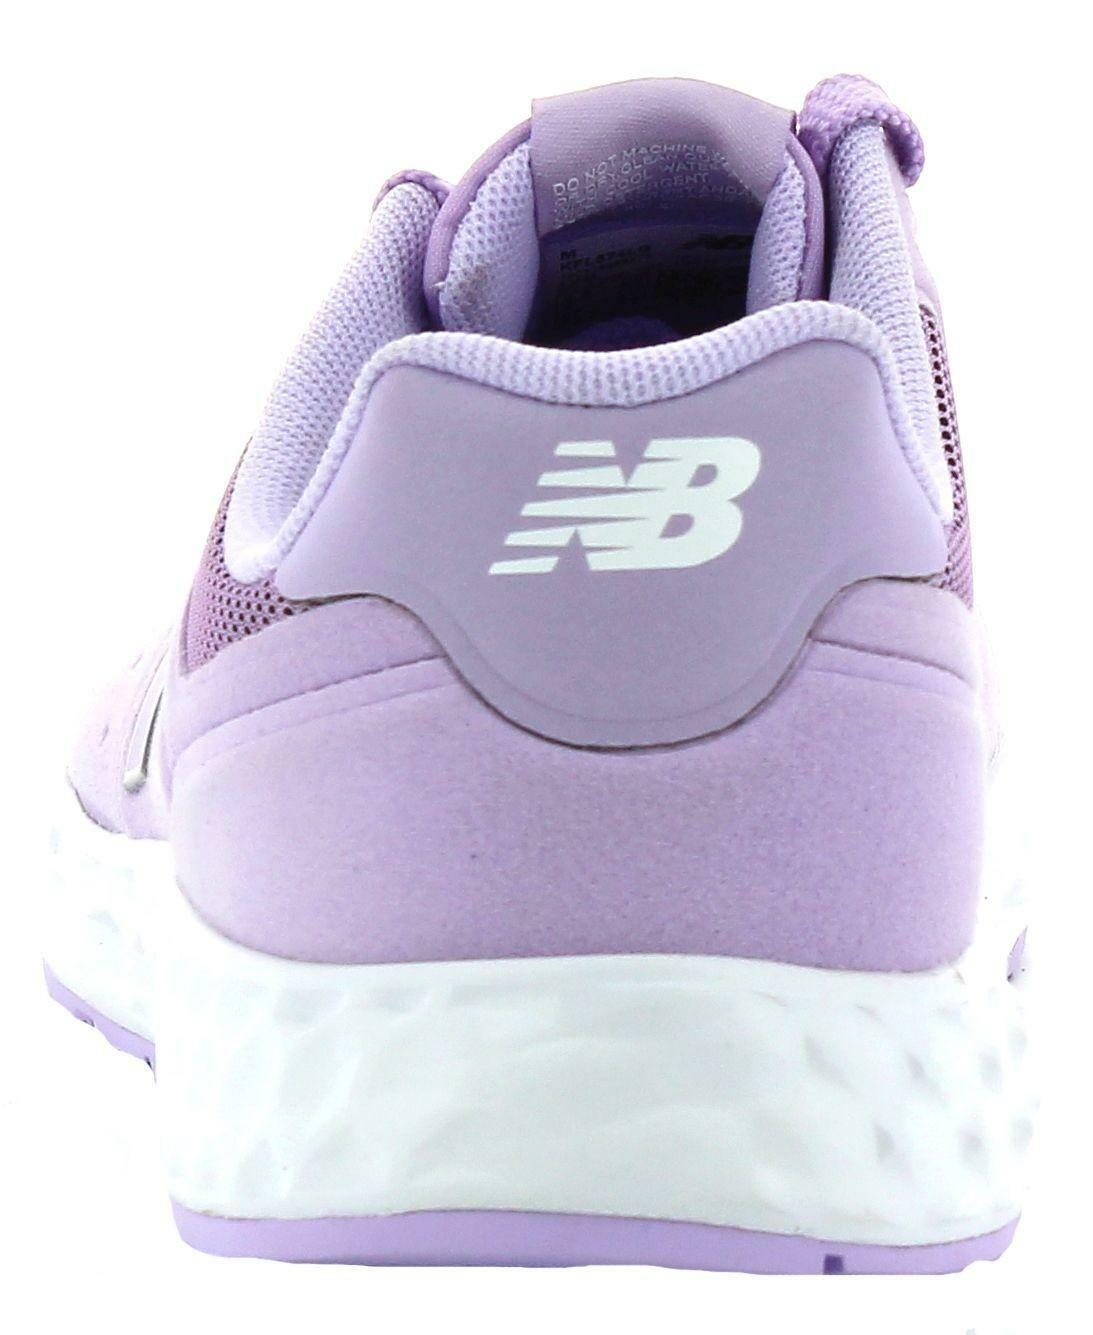 new balance new balance 574 scarpe sportive lilla